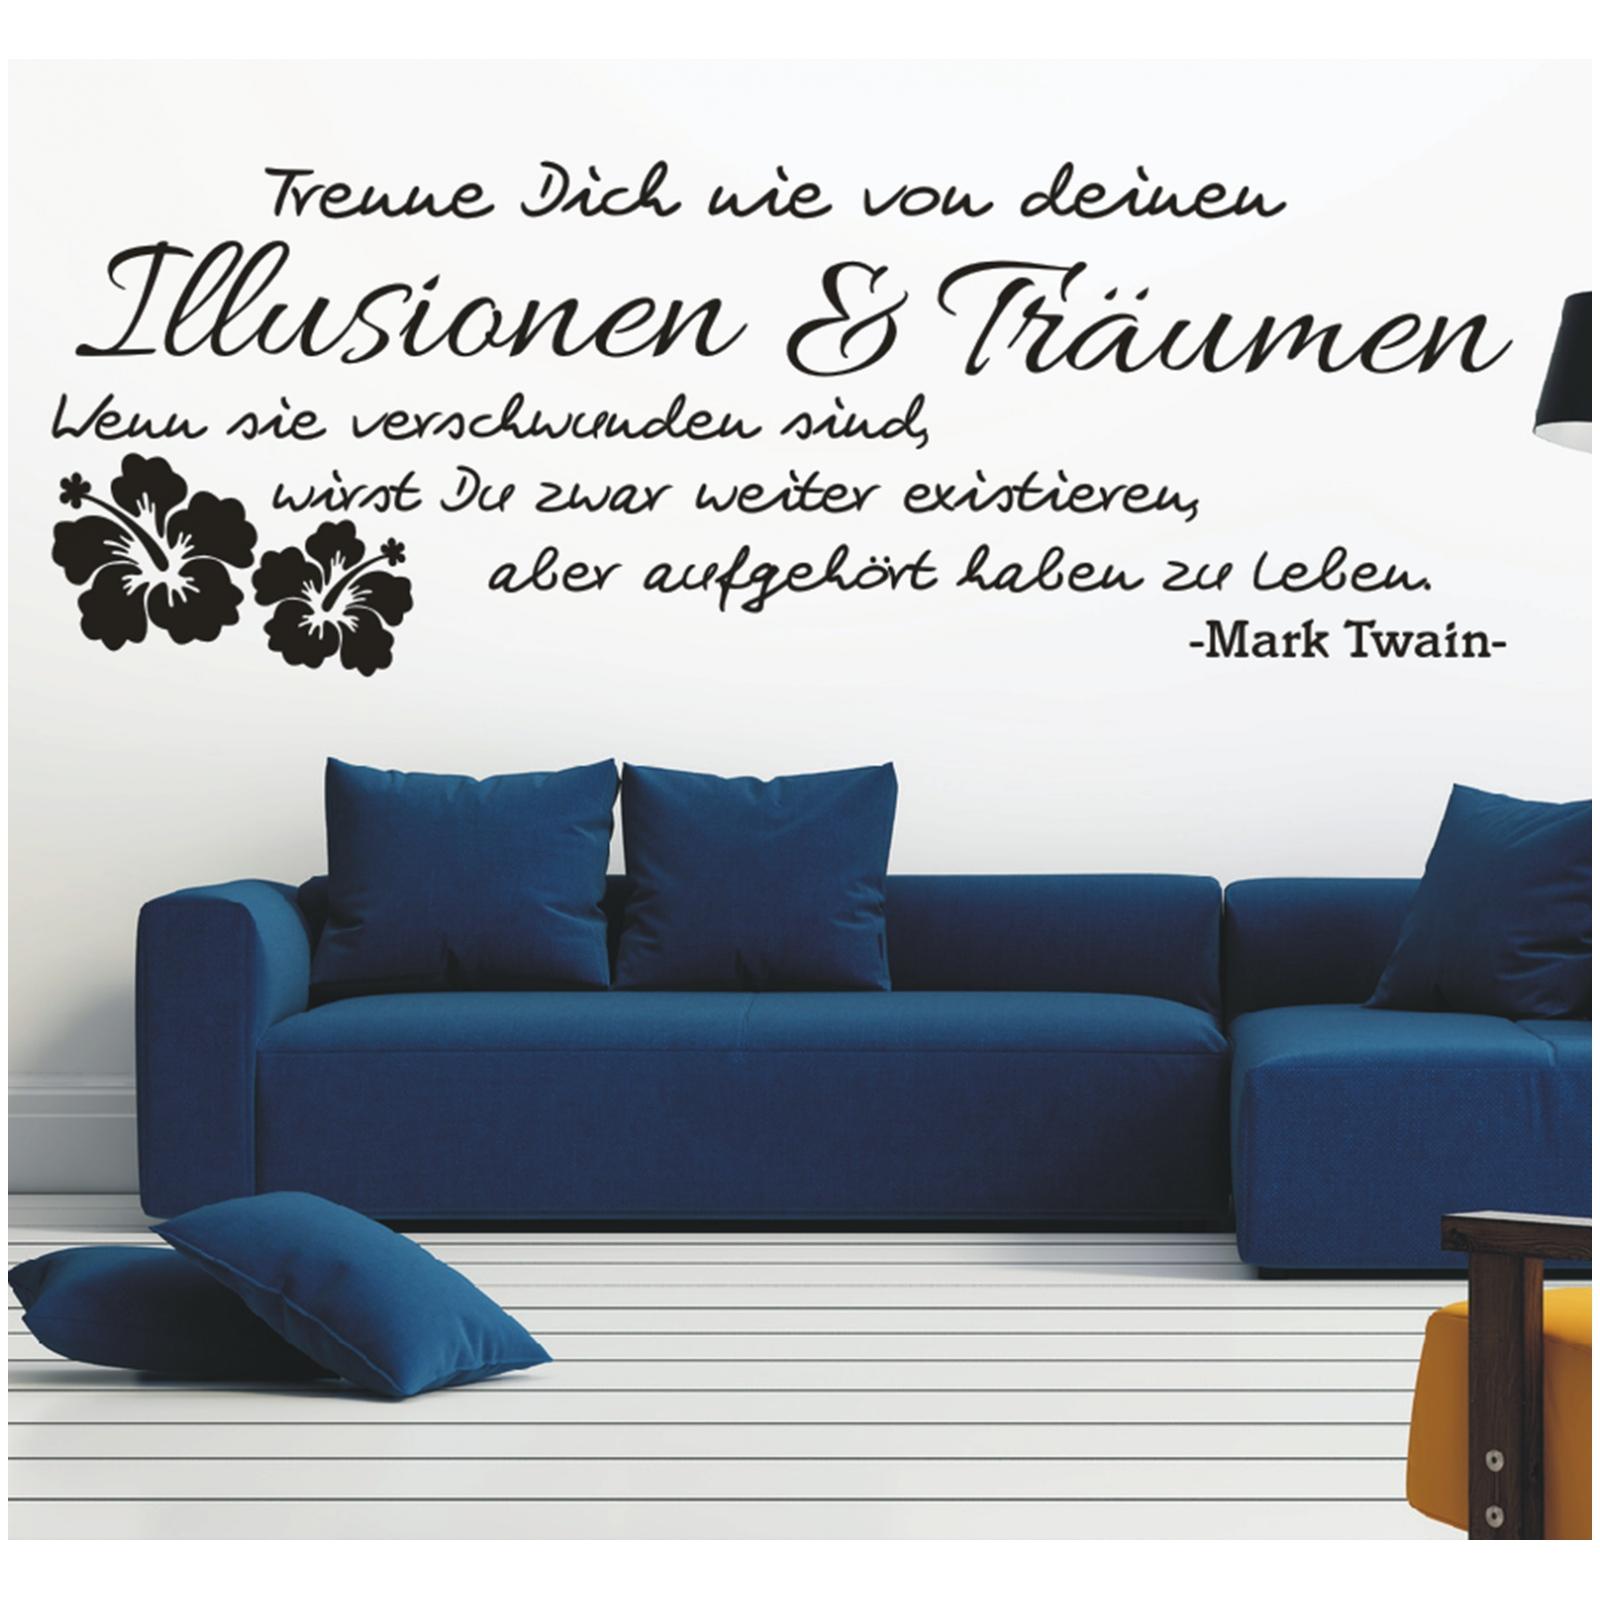 Spruch-WANDTATTOO-Illusionen-Traeumen-Leben-Twain-Zitat-Wandaufkleber-Sticker-6